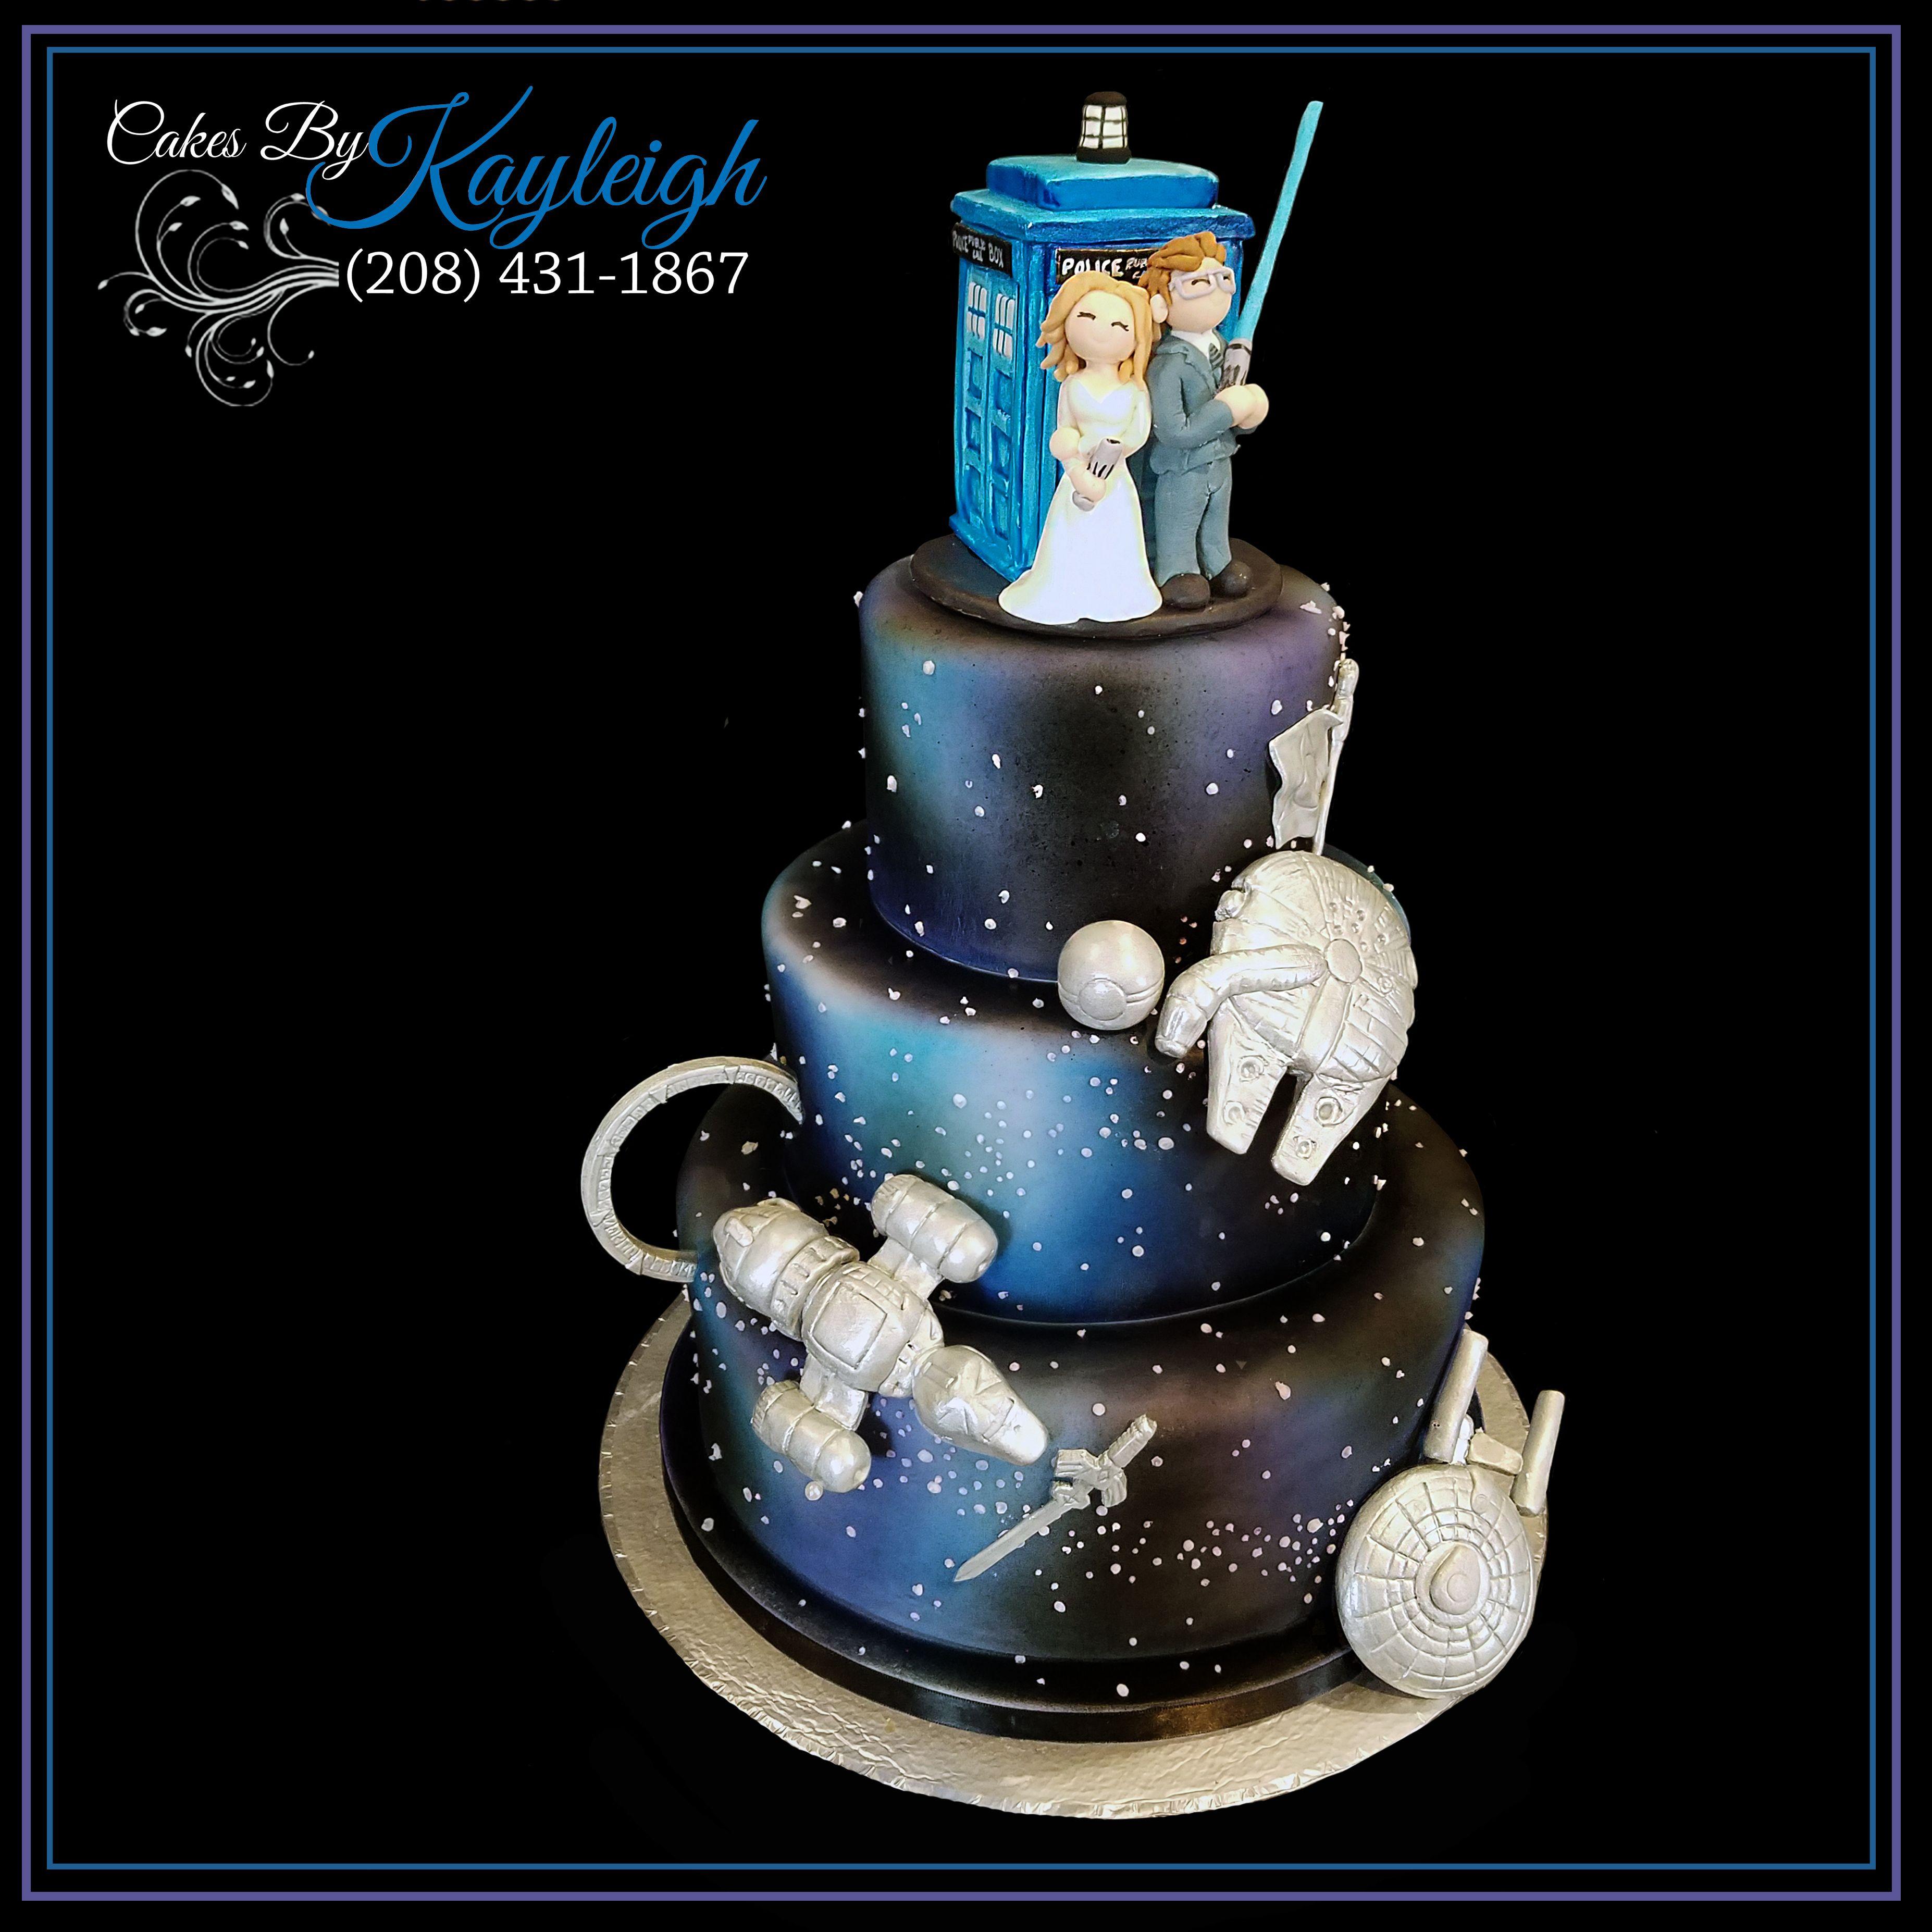 Awesome fandom wedding cake all hand crafted fondant